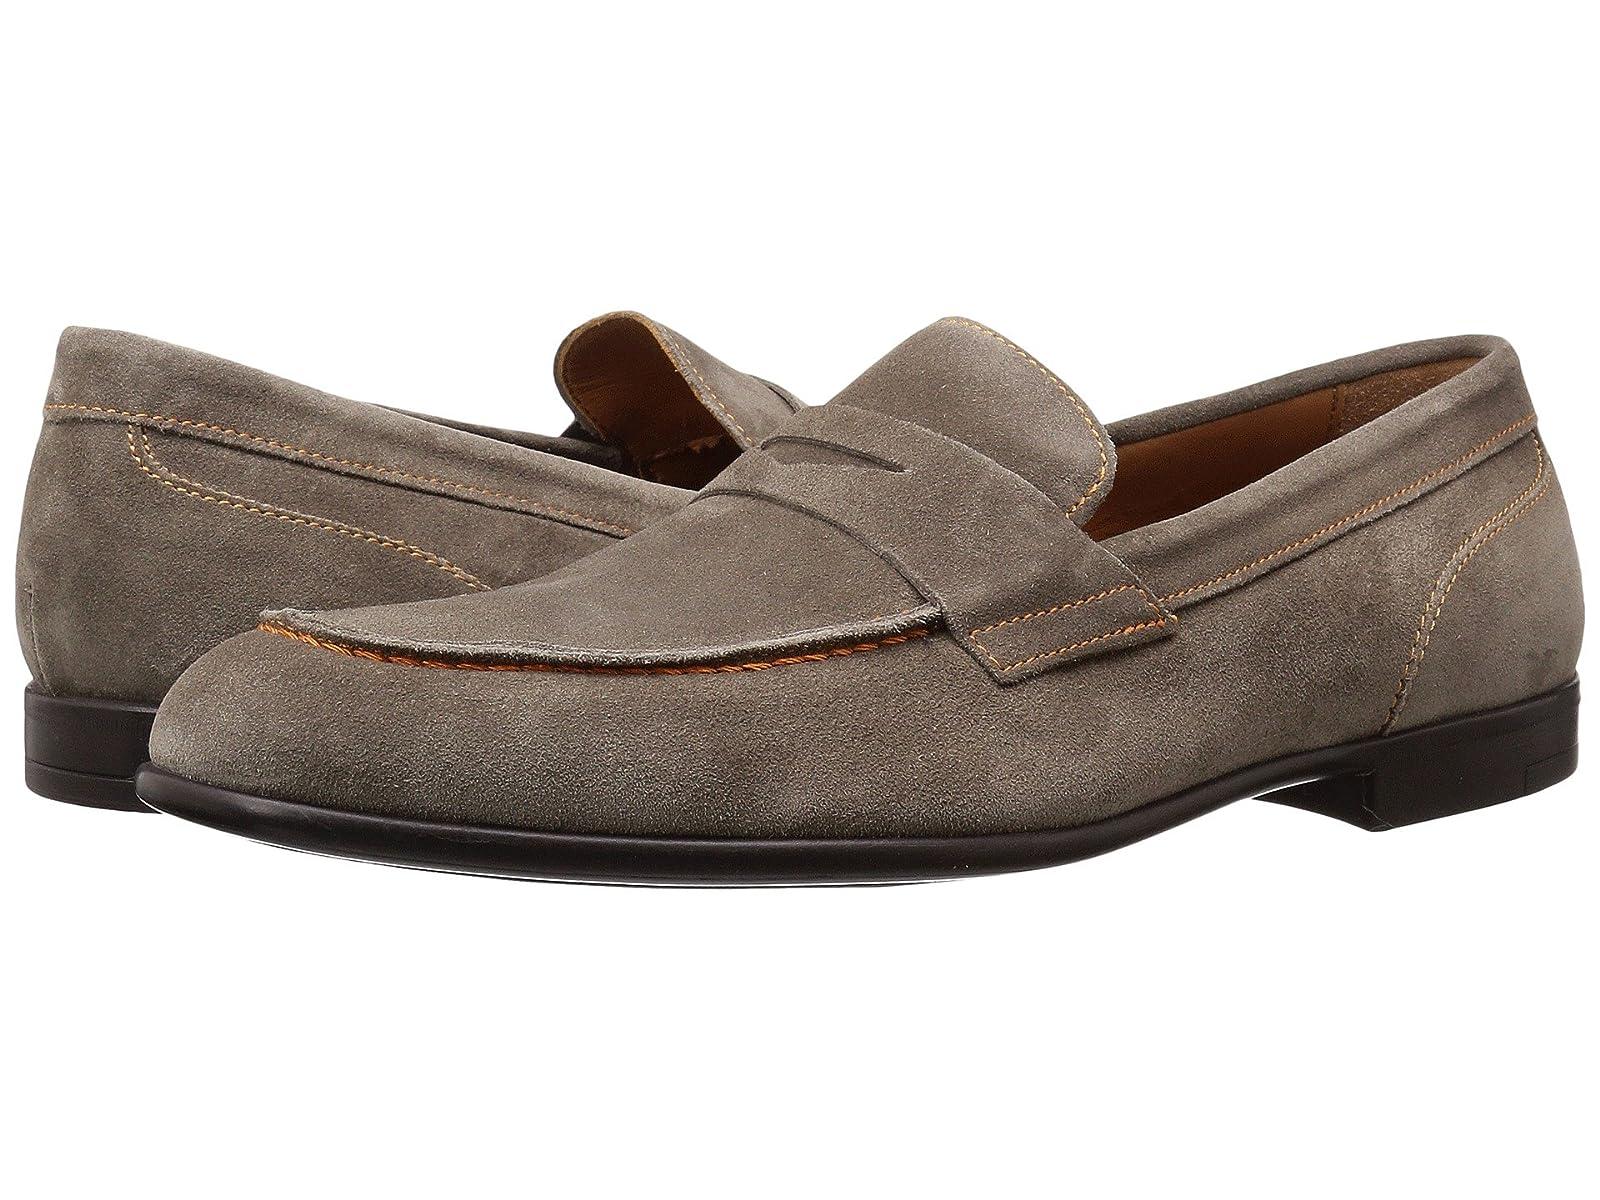 Bruno Magli SilasAtmospheric grades have affordable shoes